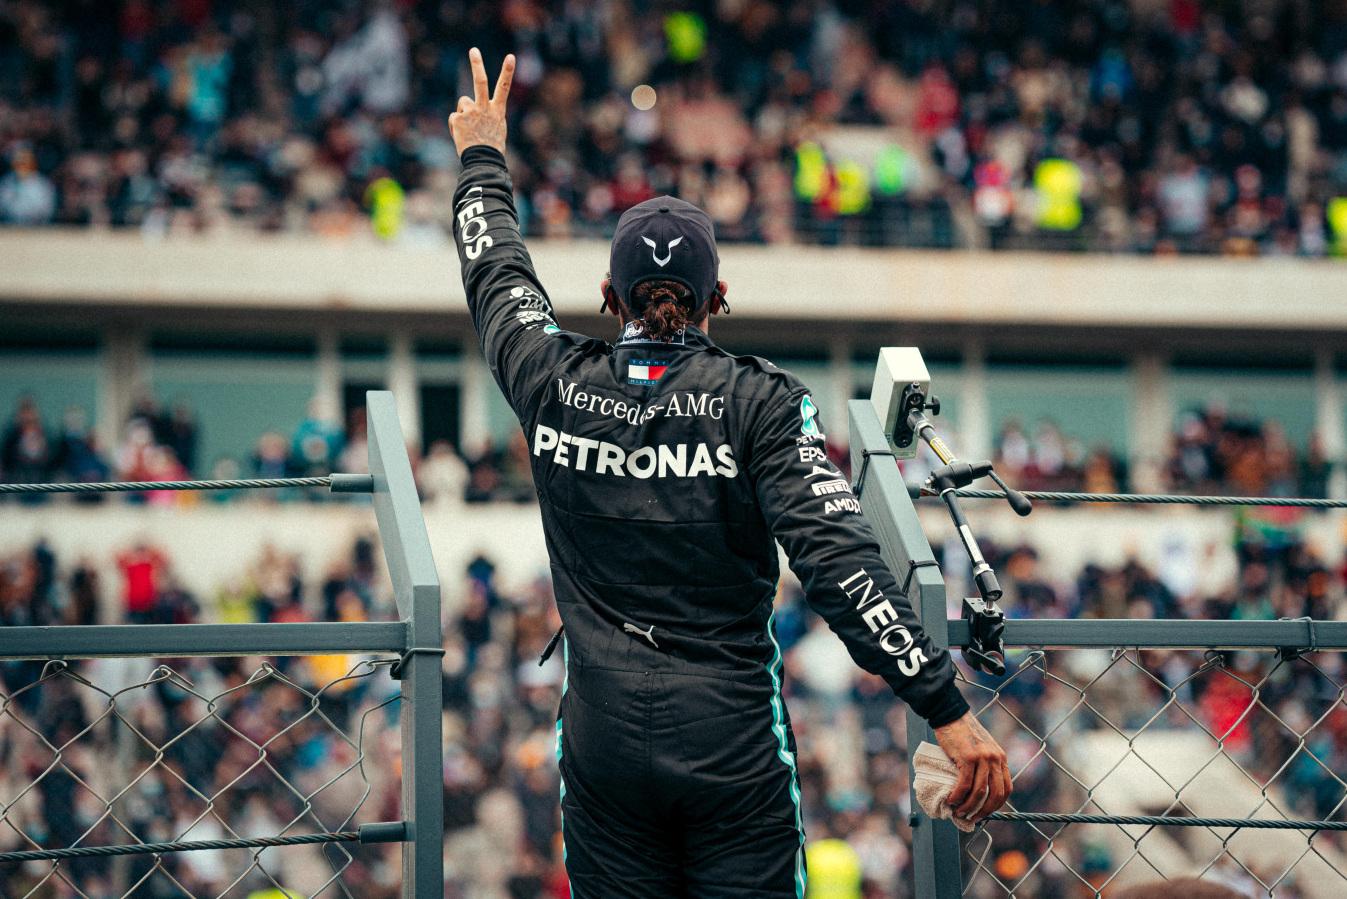 Hamilton clocks in 8th on Forbes highest-paid athletes list